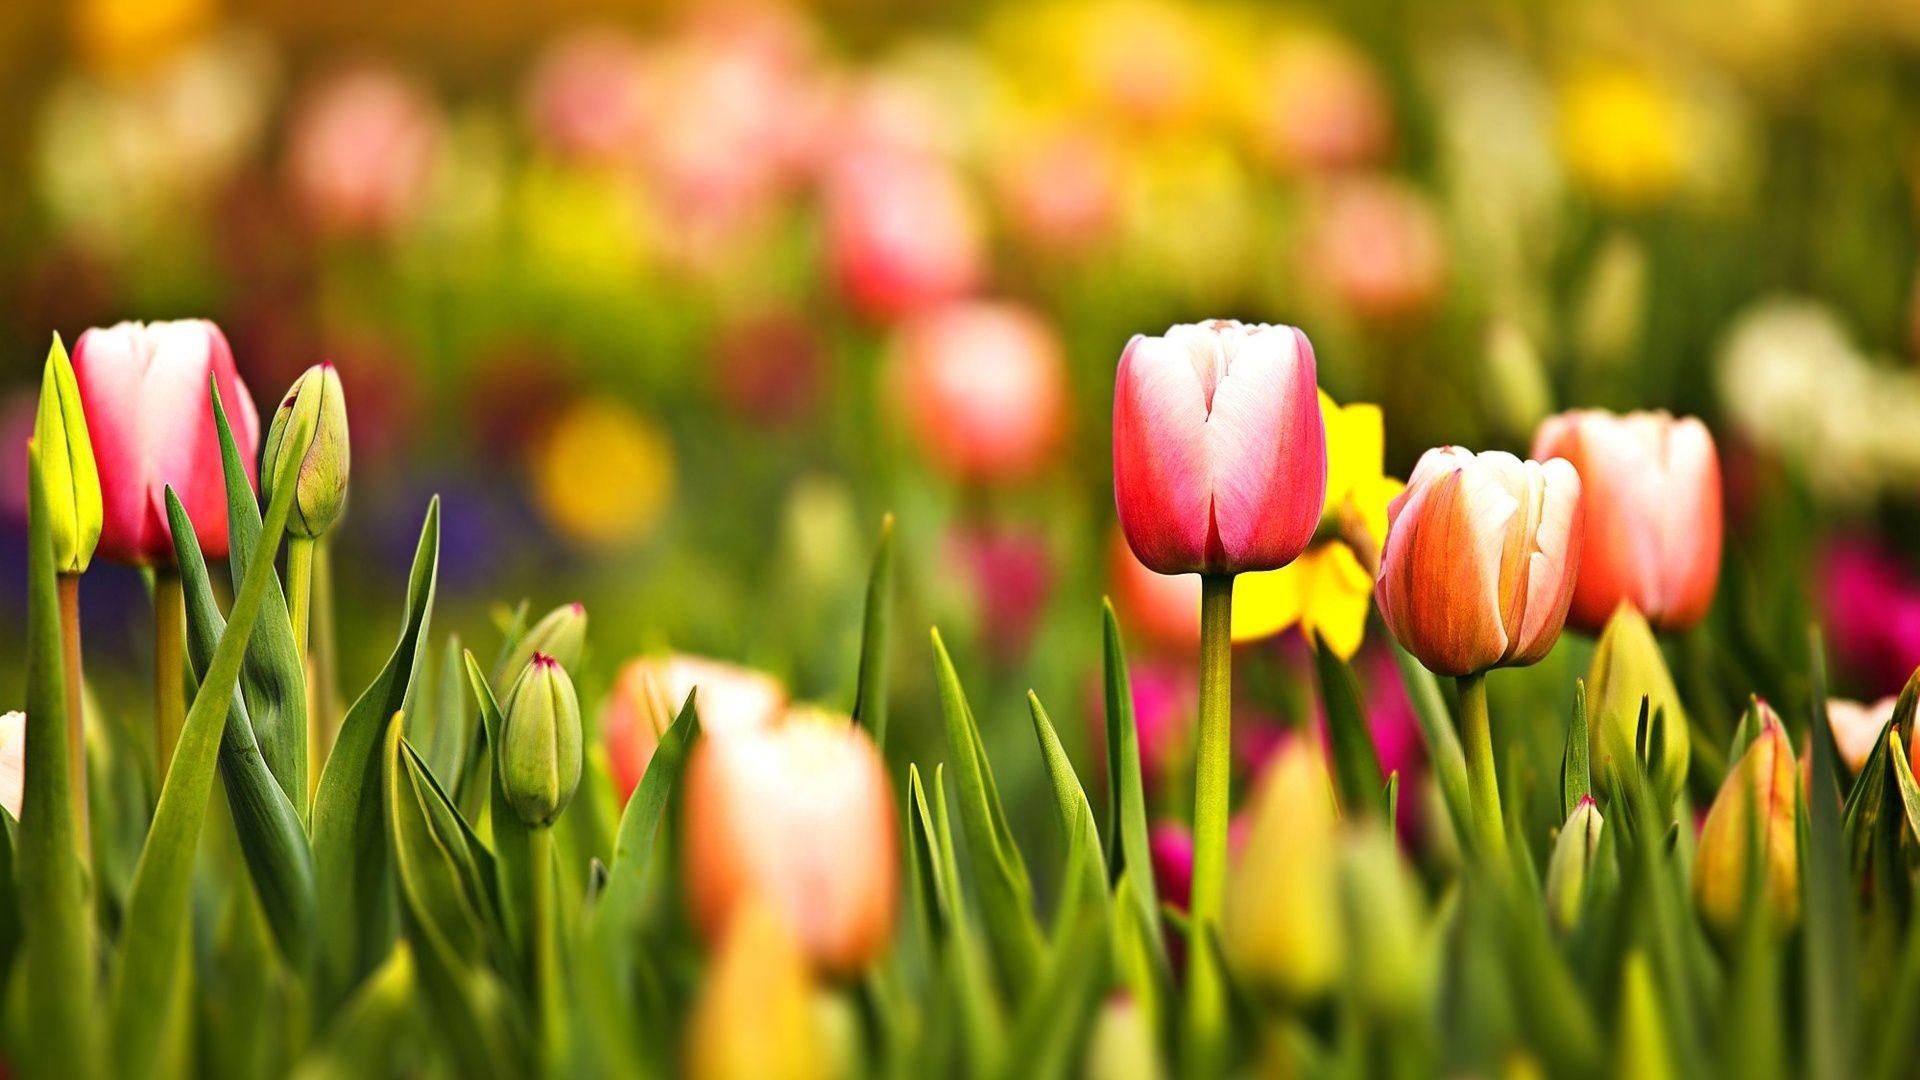 … Spring Tulip Desktop Wallpaper Wallpaper Hd. Download